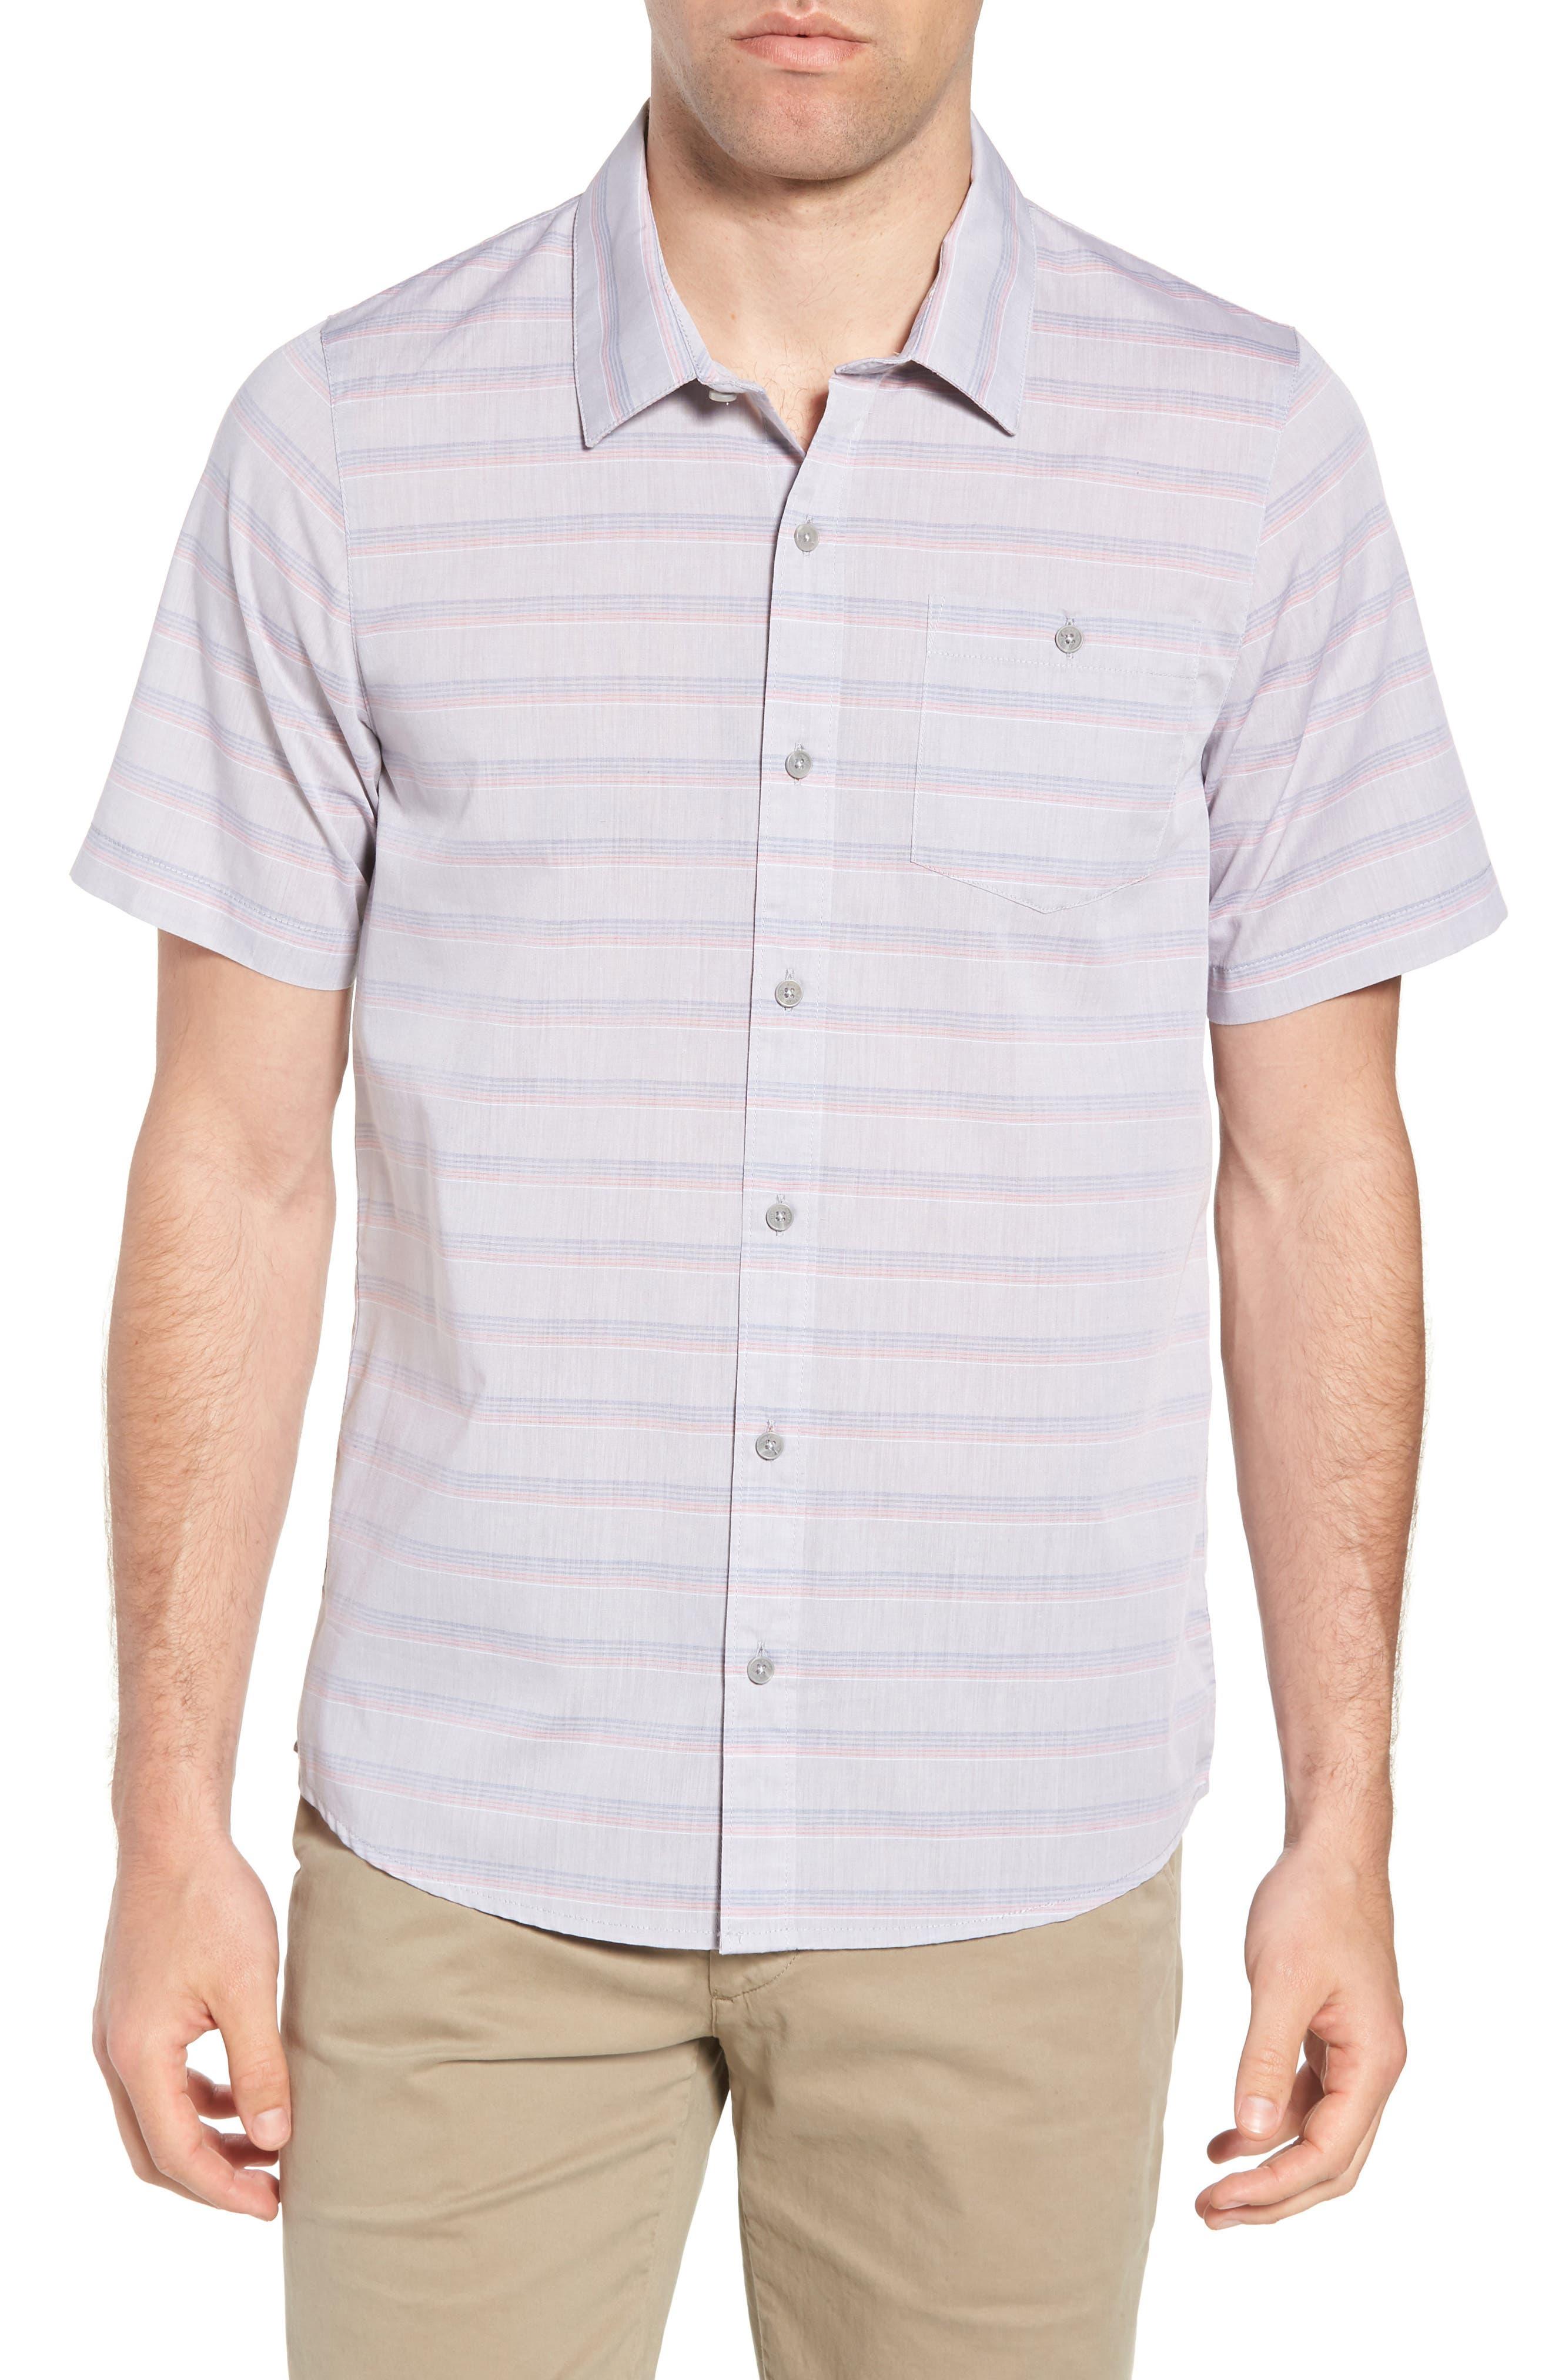 Comet Regular Fit Short Sleeve Sport Shirt,                             Main thumbnail 1, color,                             020